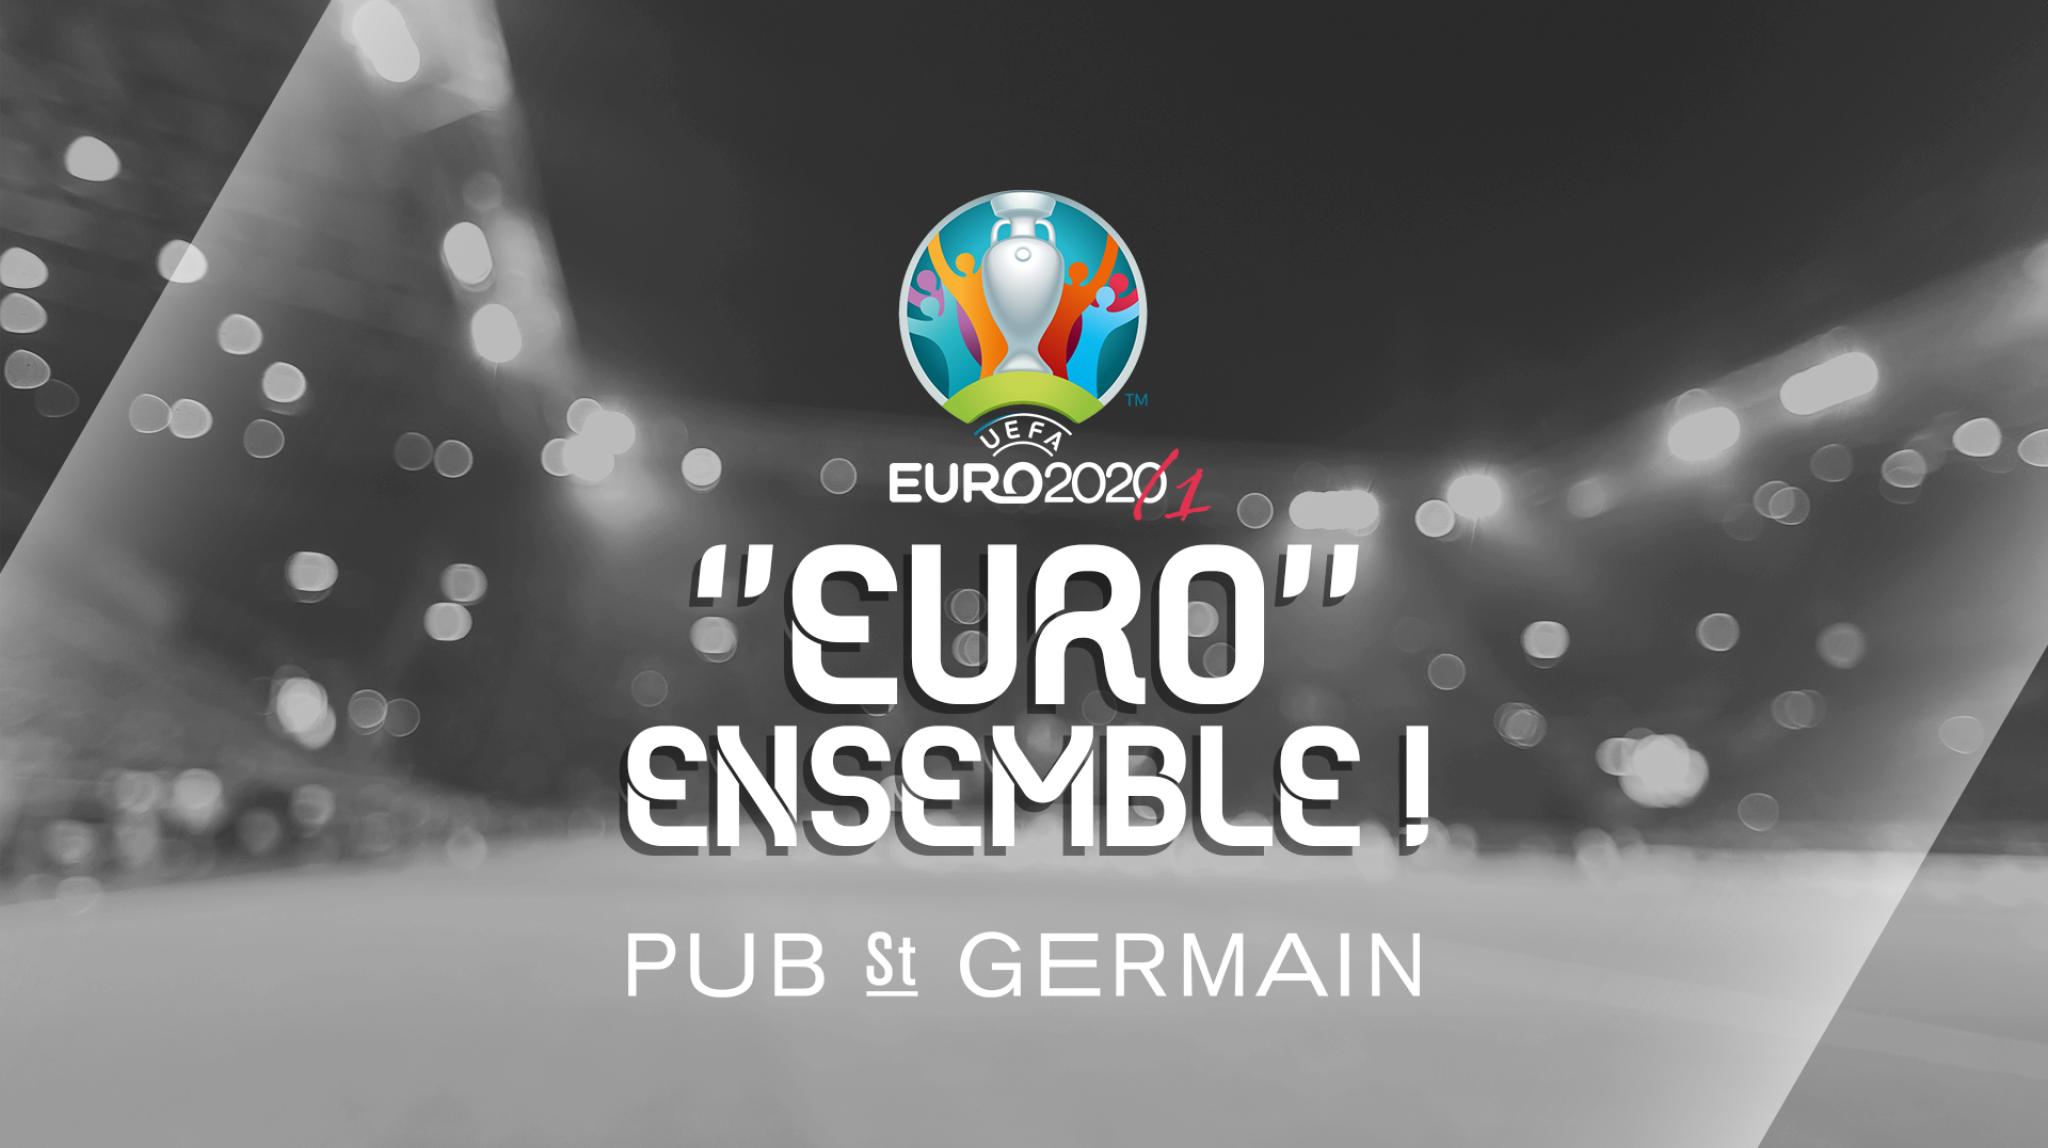 EURO live at PUB St GERMAIN